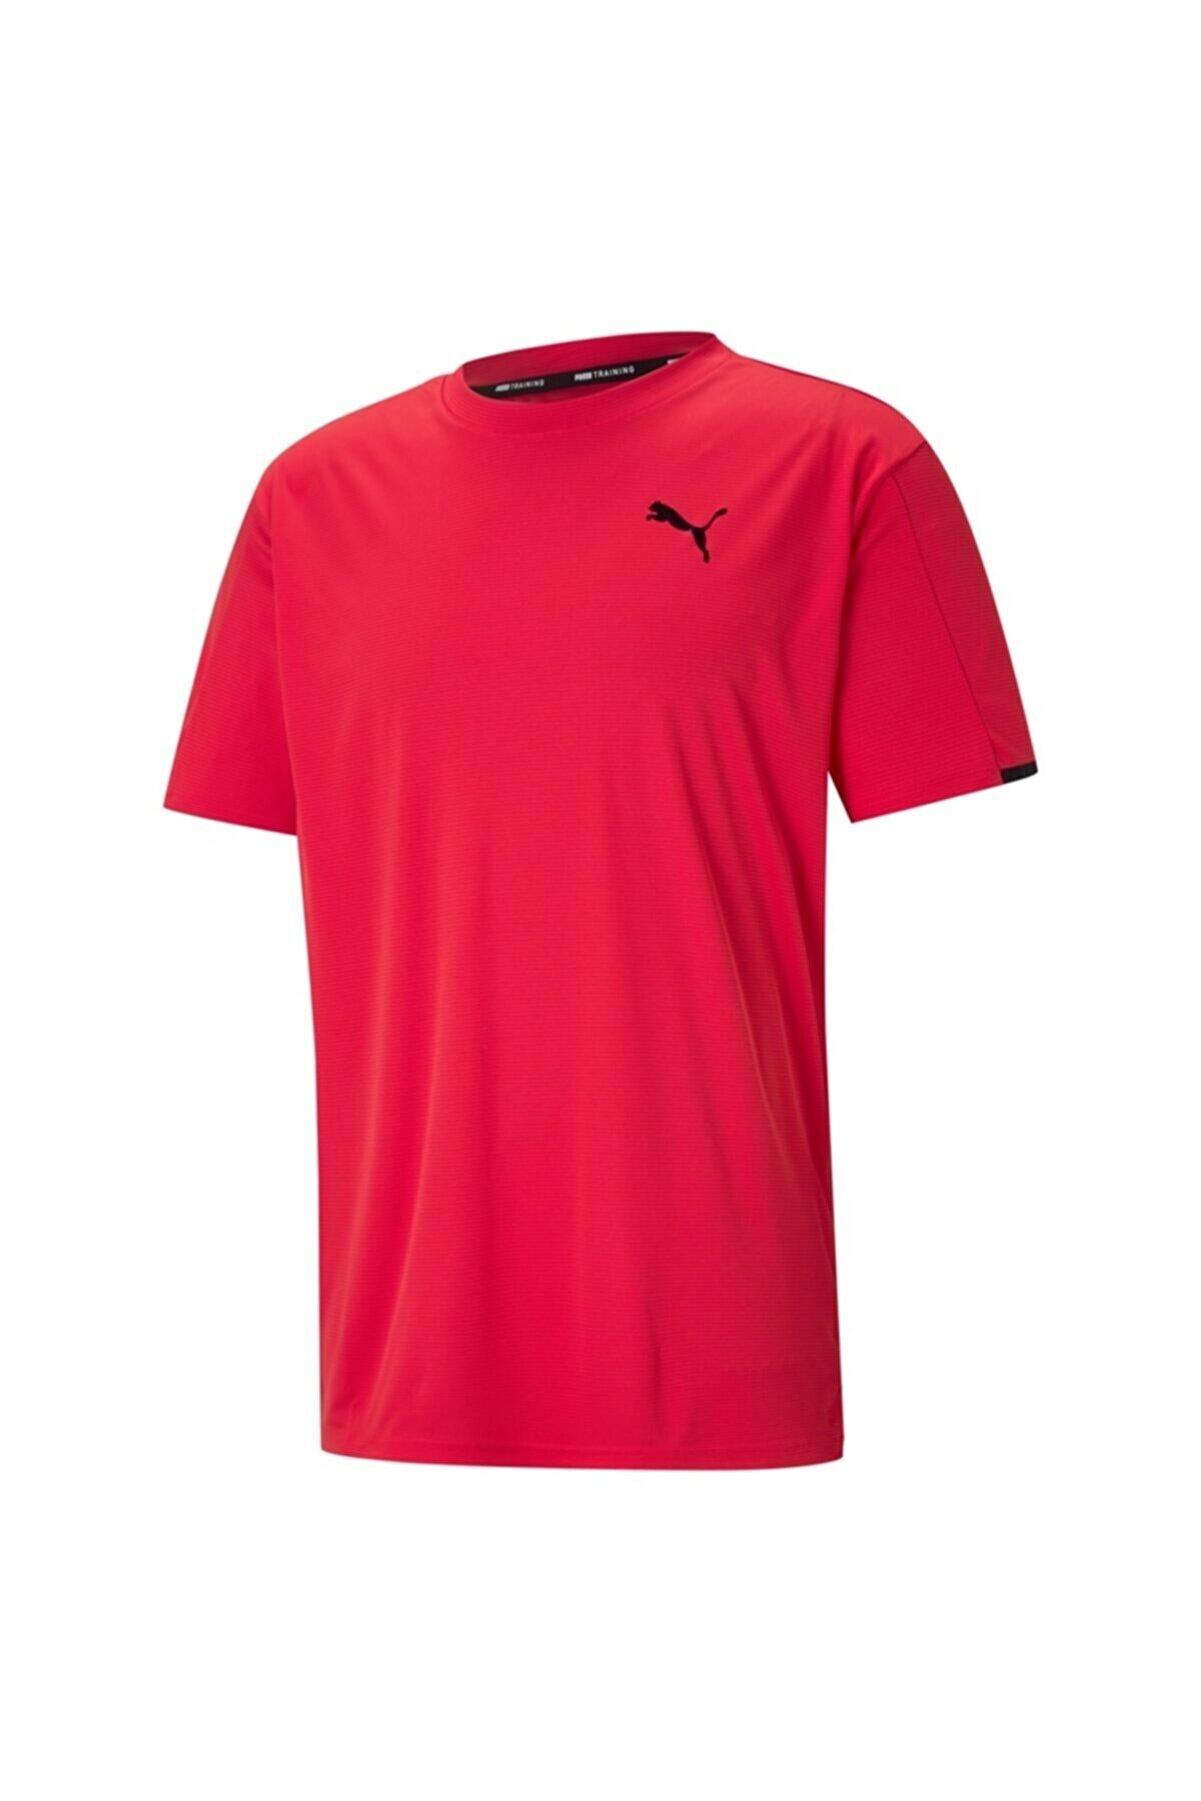 Puma Traın Graphıc Ss Tee Erkek Üst & T-shirt - 52011623